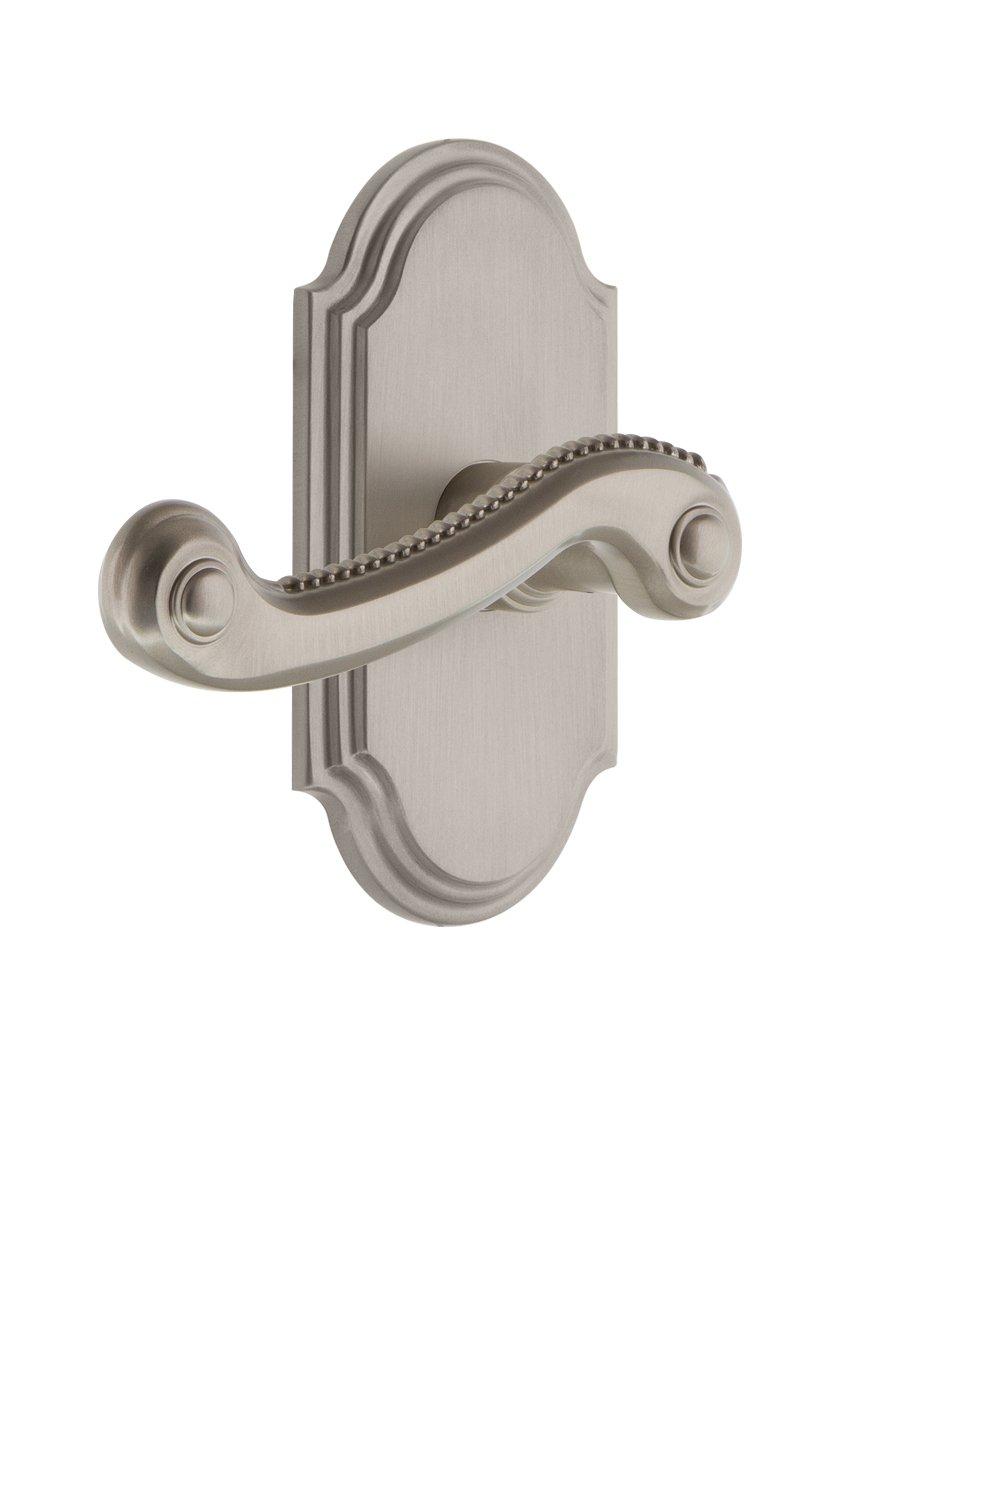 Grandeur 822497 Arc Plate Privacy with Newport Lever in Satin Nickel 2.75